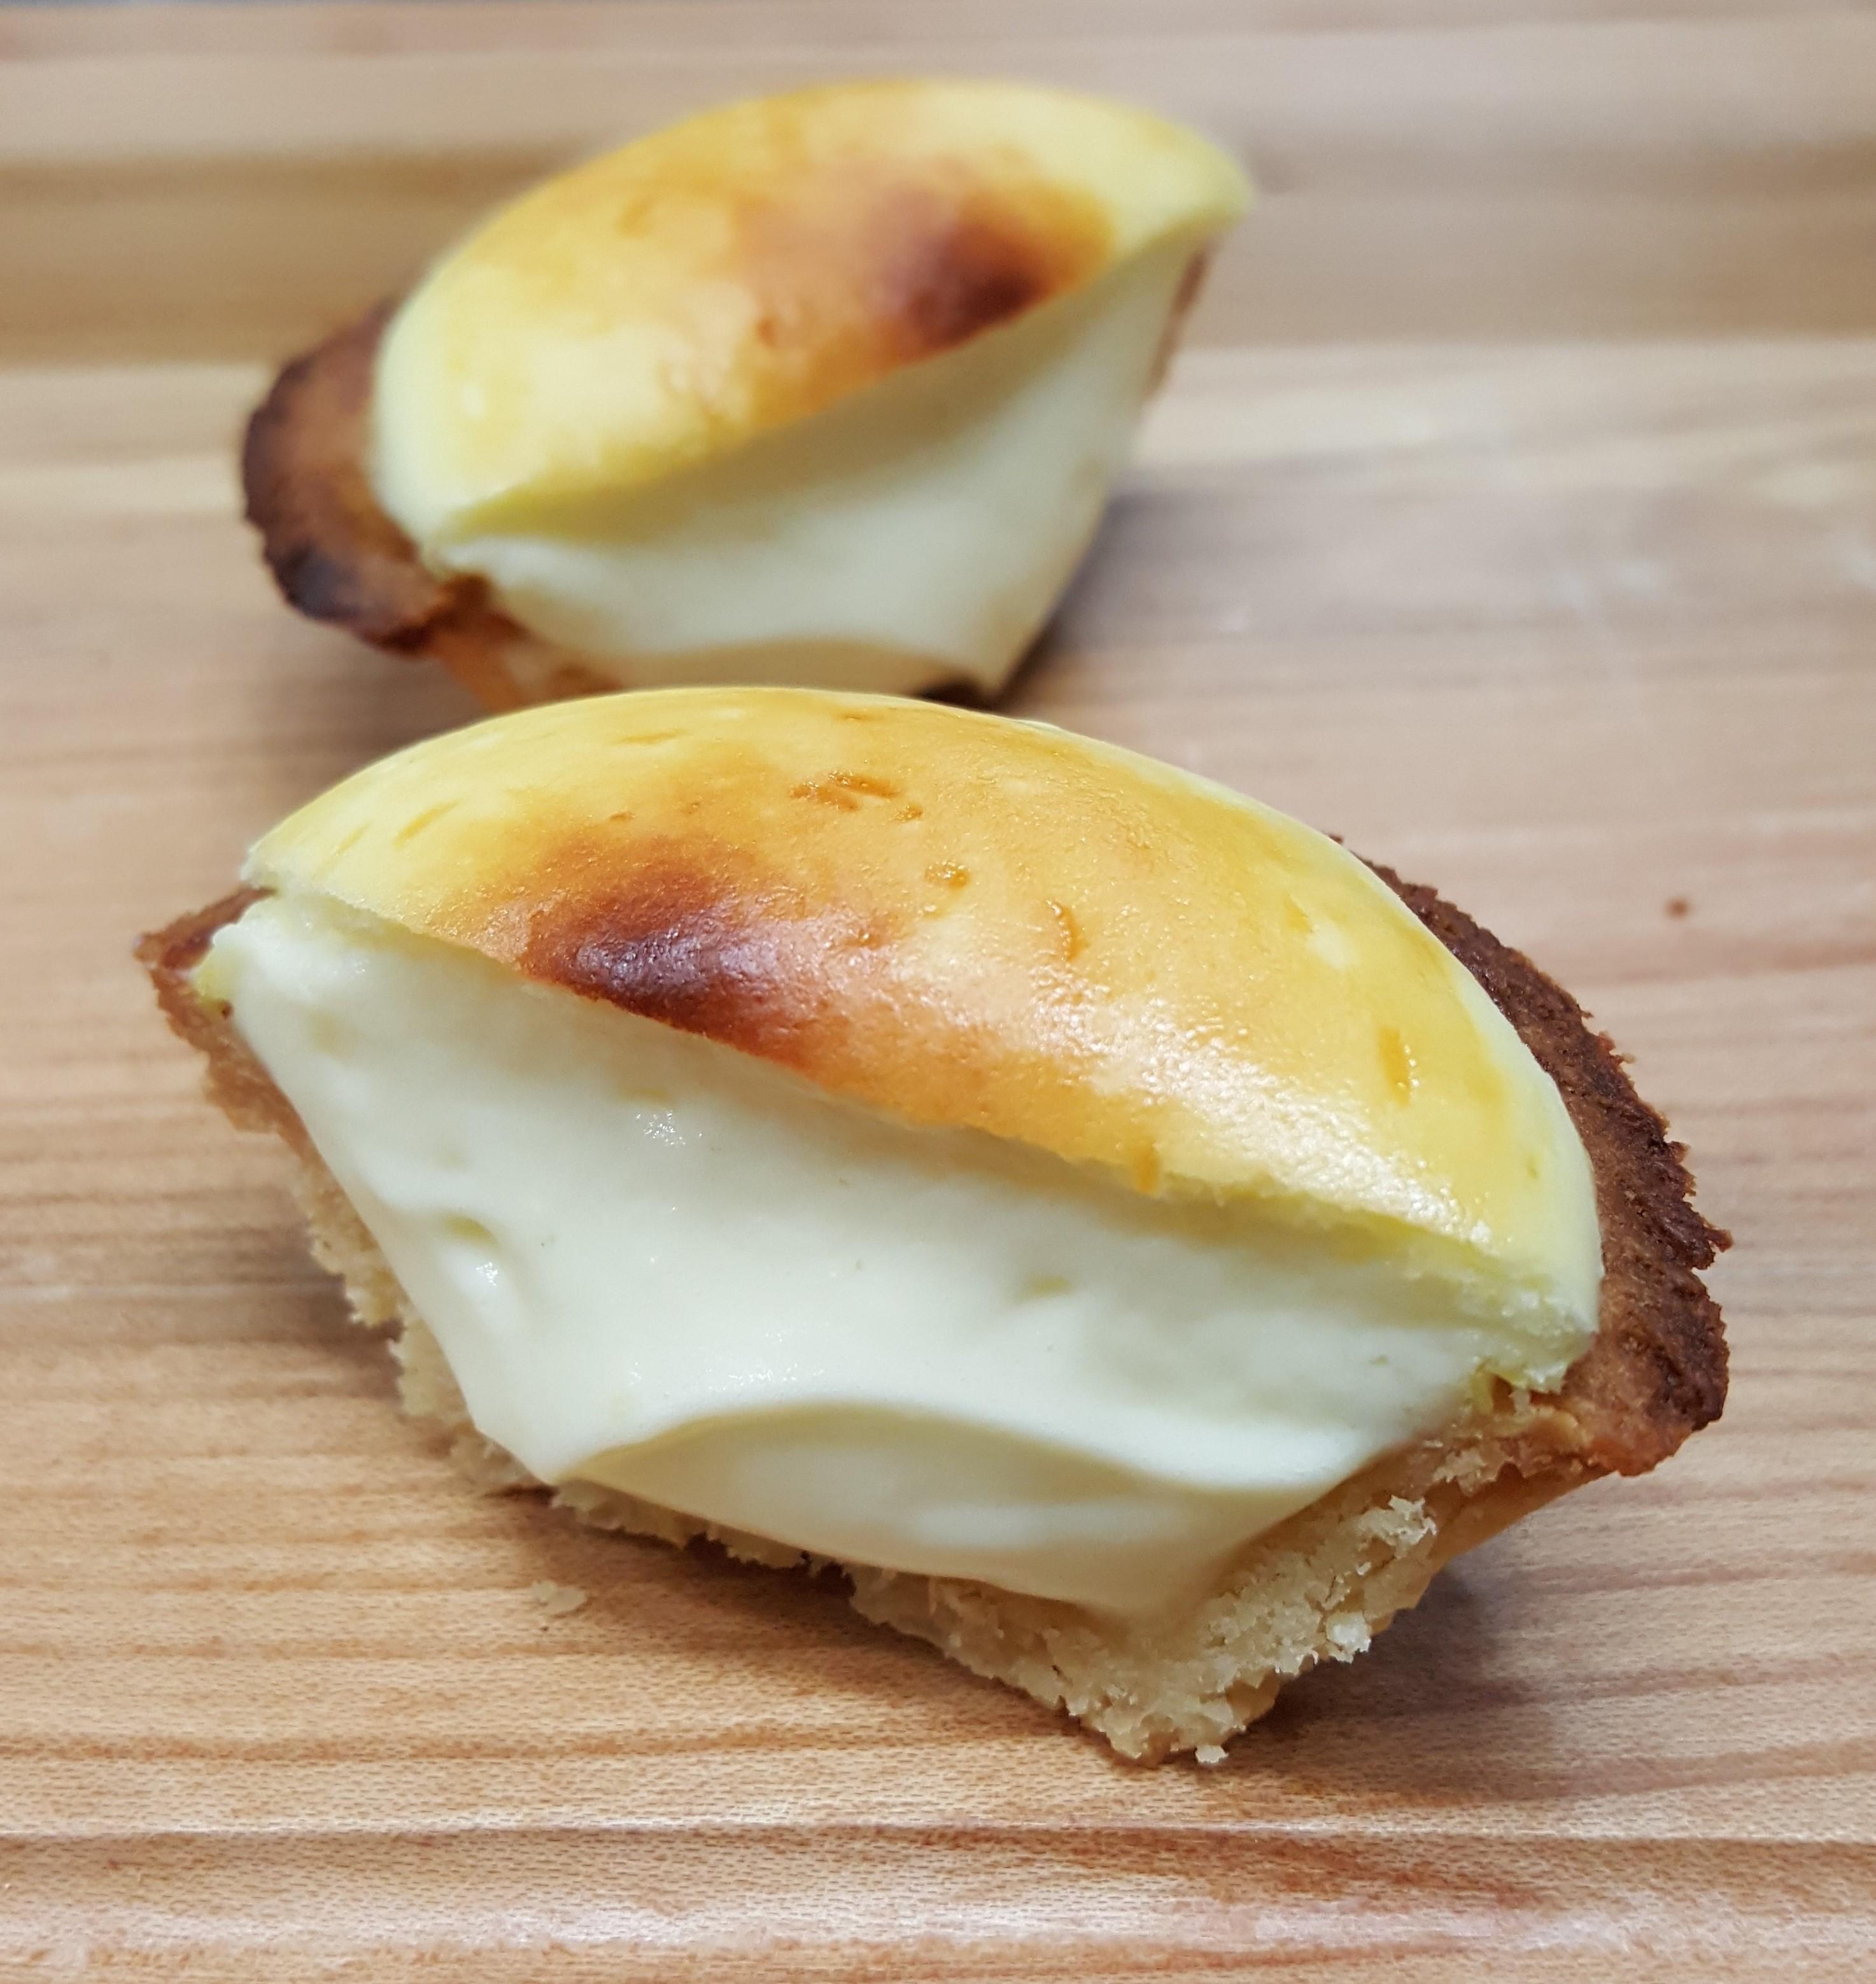 Cheddar Cheese Tart